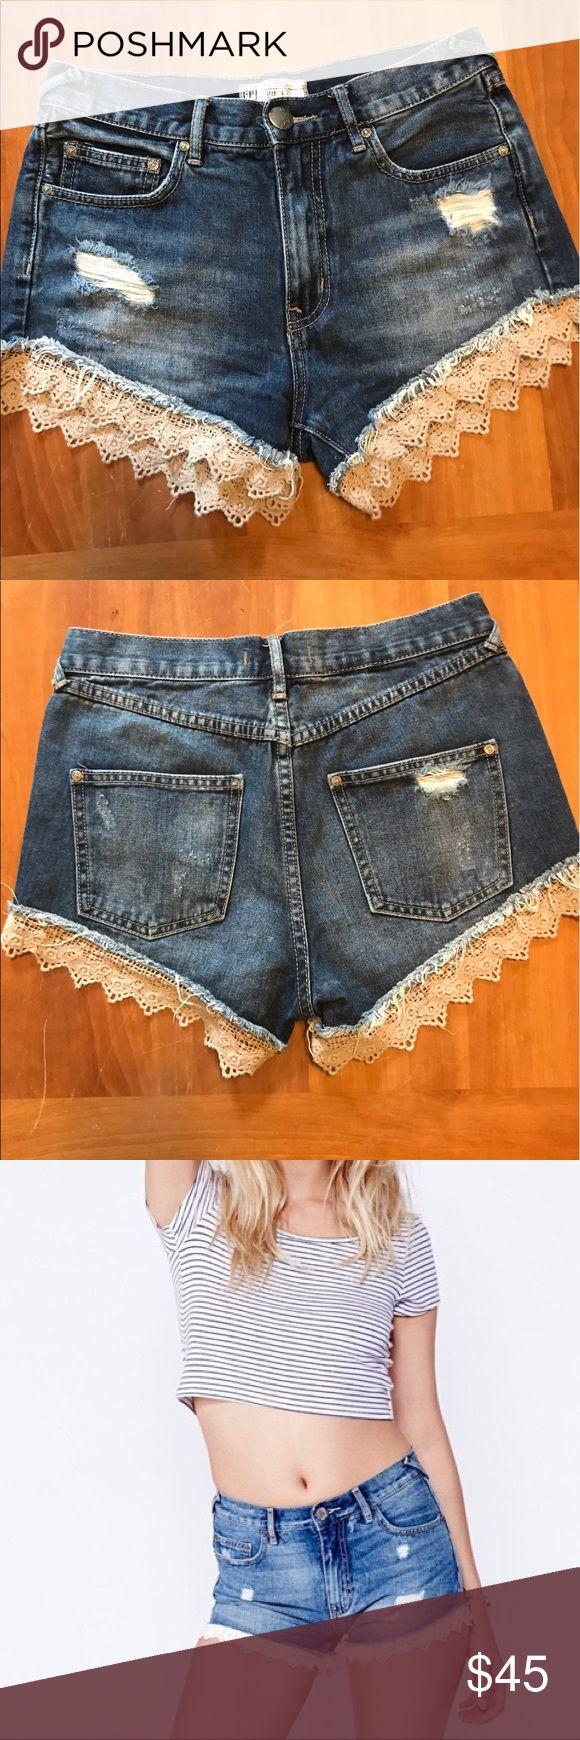 Free People Lace Denim Shorts Size 25 classic lace denim shorts. Gently worn. Free People Shorts Jean Shorts